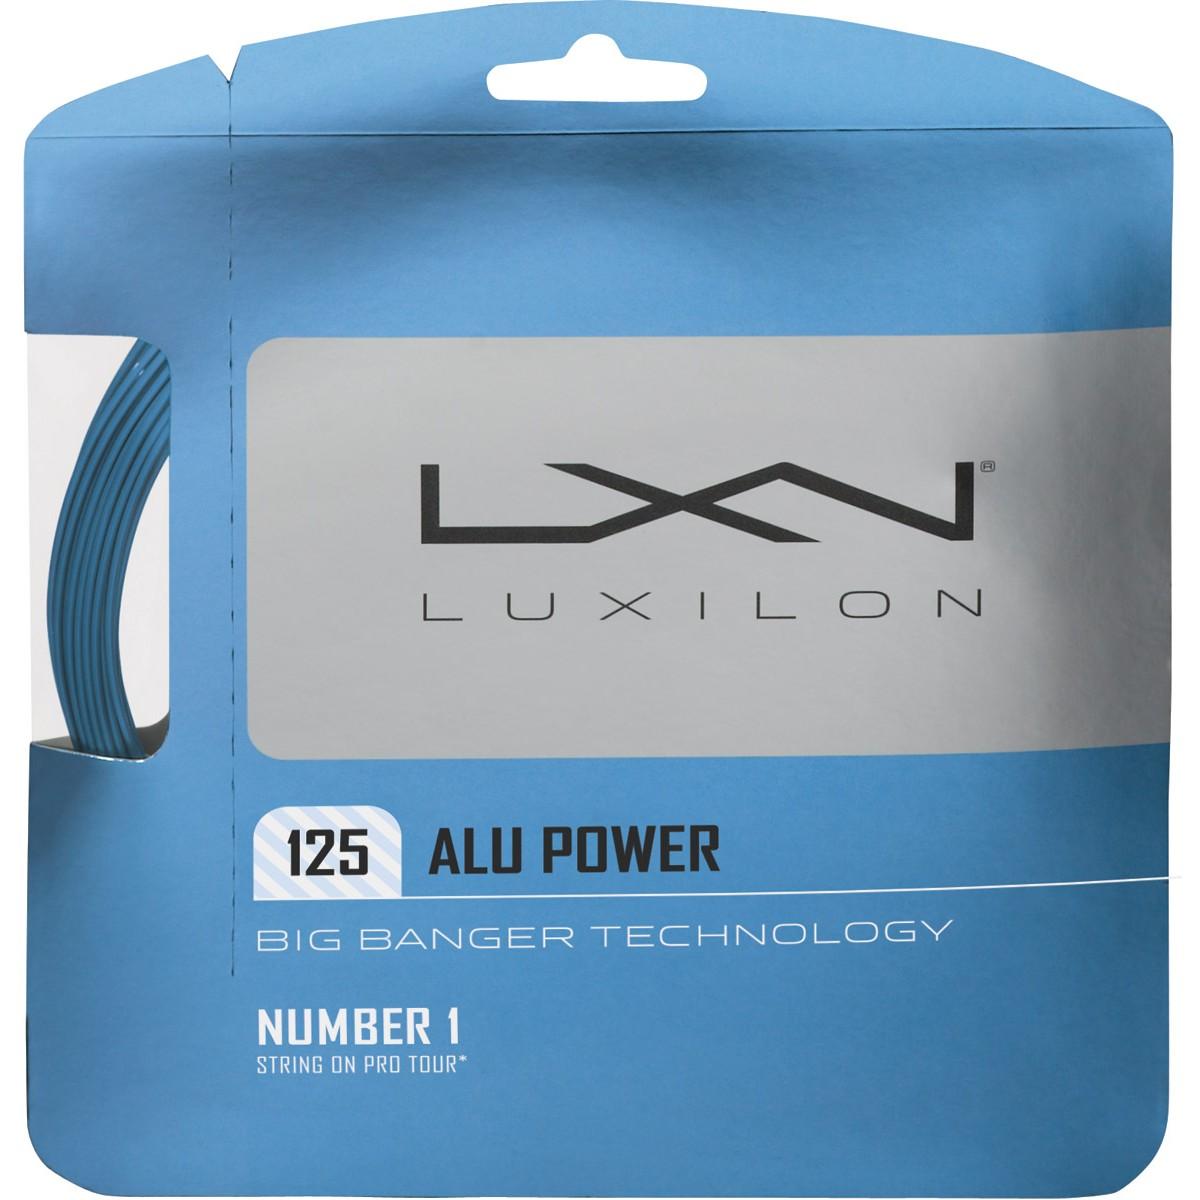 CORDAGE LUXILON BIG BANGER ALU POWER ICE BLUE (12 METRES)